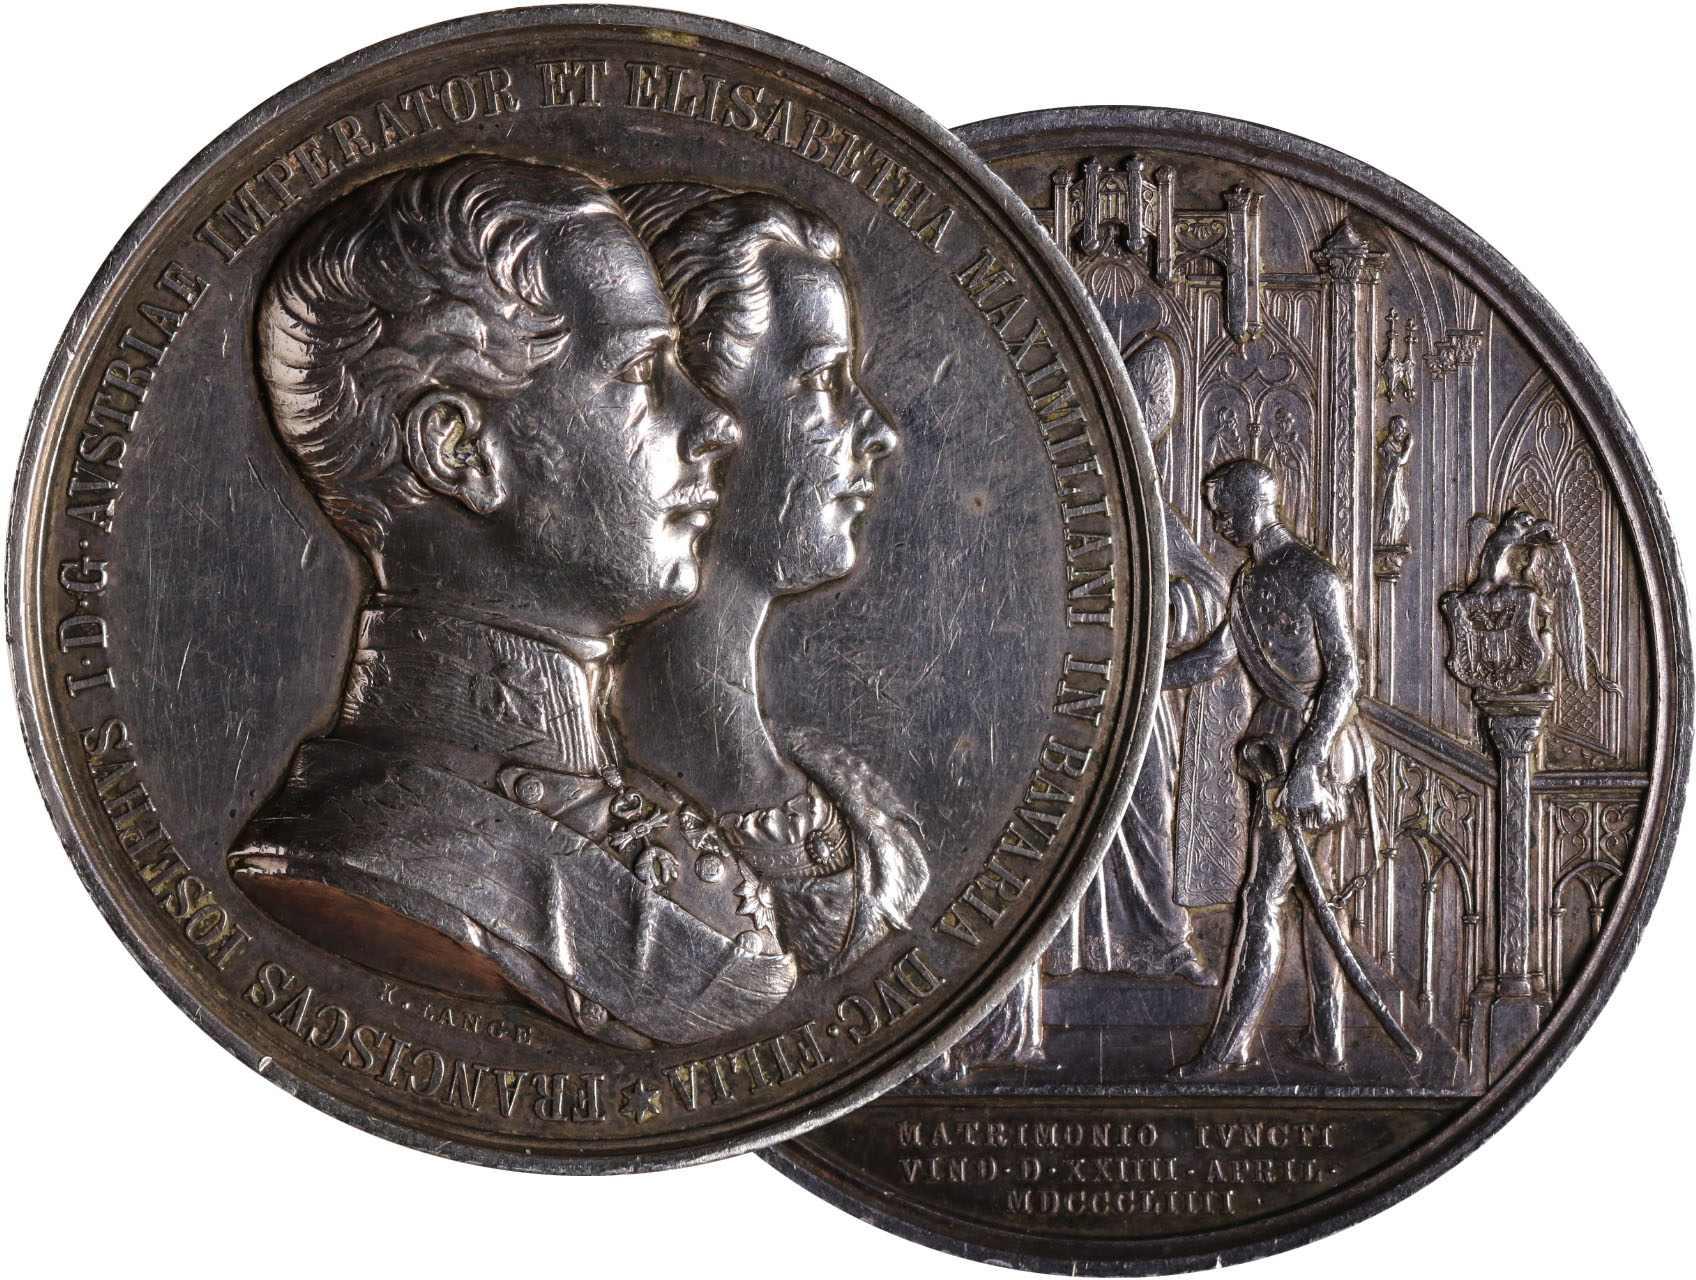 Osobnosti - František Josef I. 1830-1916, AR Svatební medaile 1854 F.J.I., 56 mm, 79,93 g, sig.Lange, Hauser 297